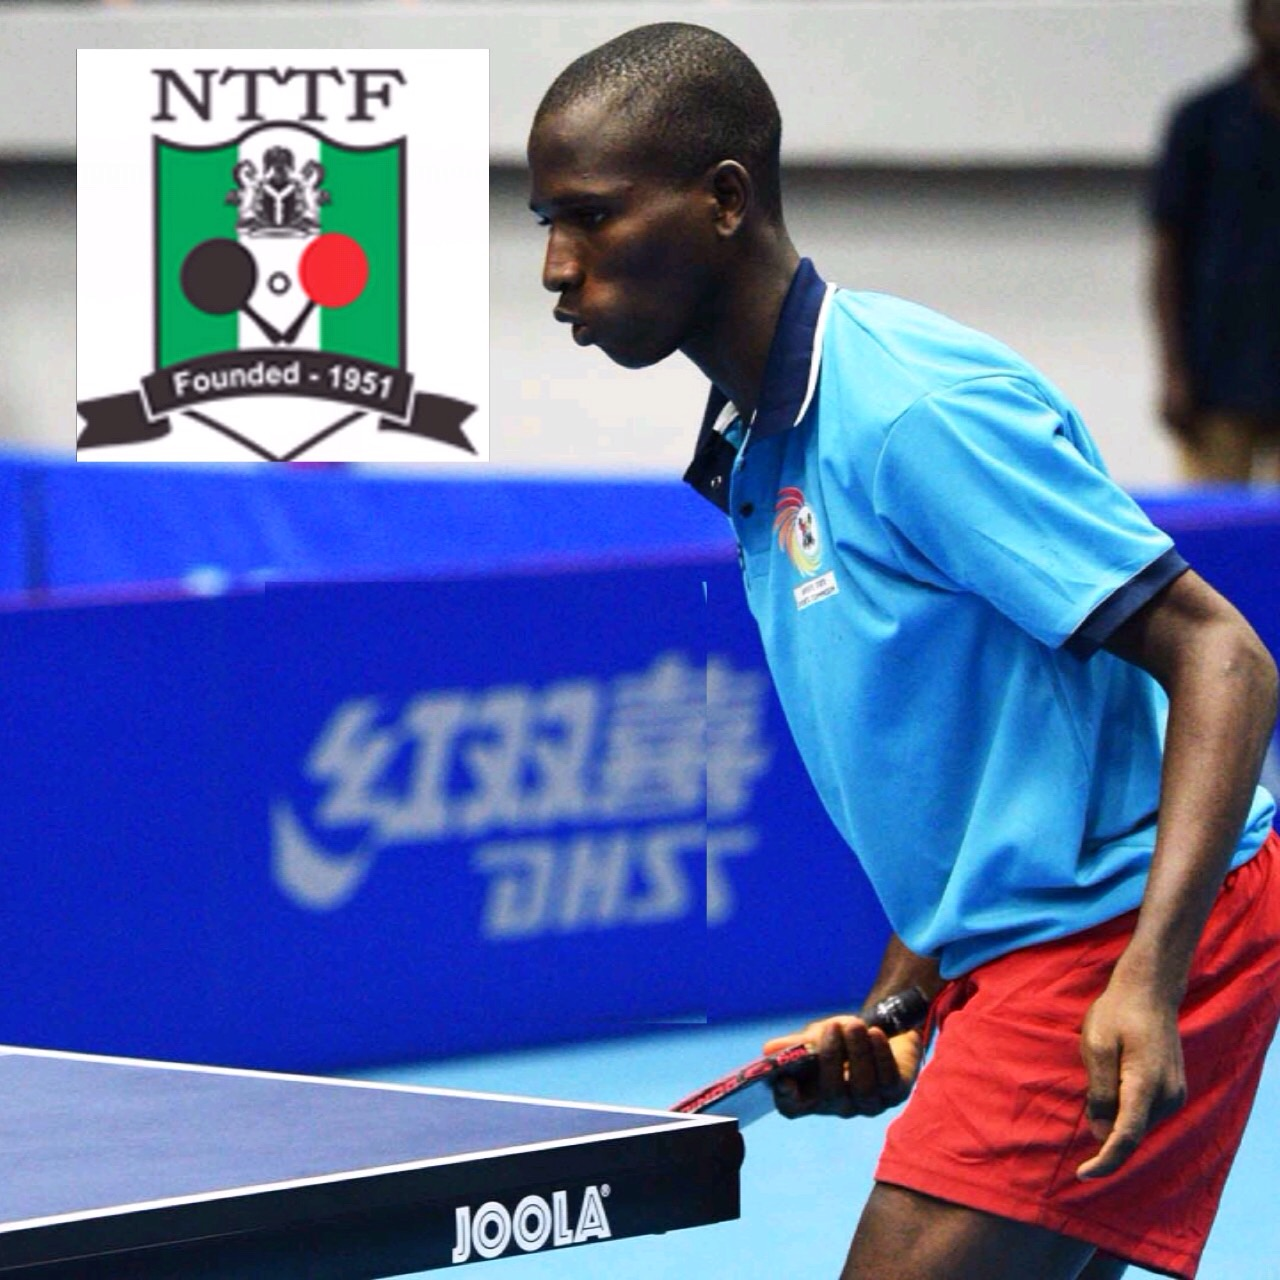 Paris Based NGO Donates Tennis Equipment To NTTF